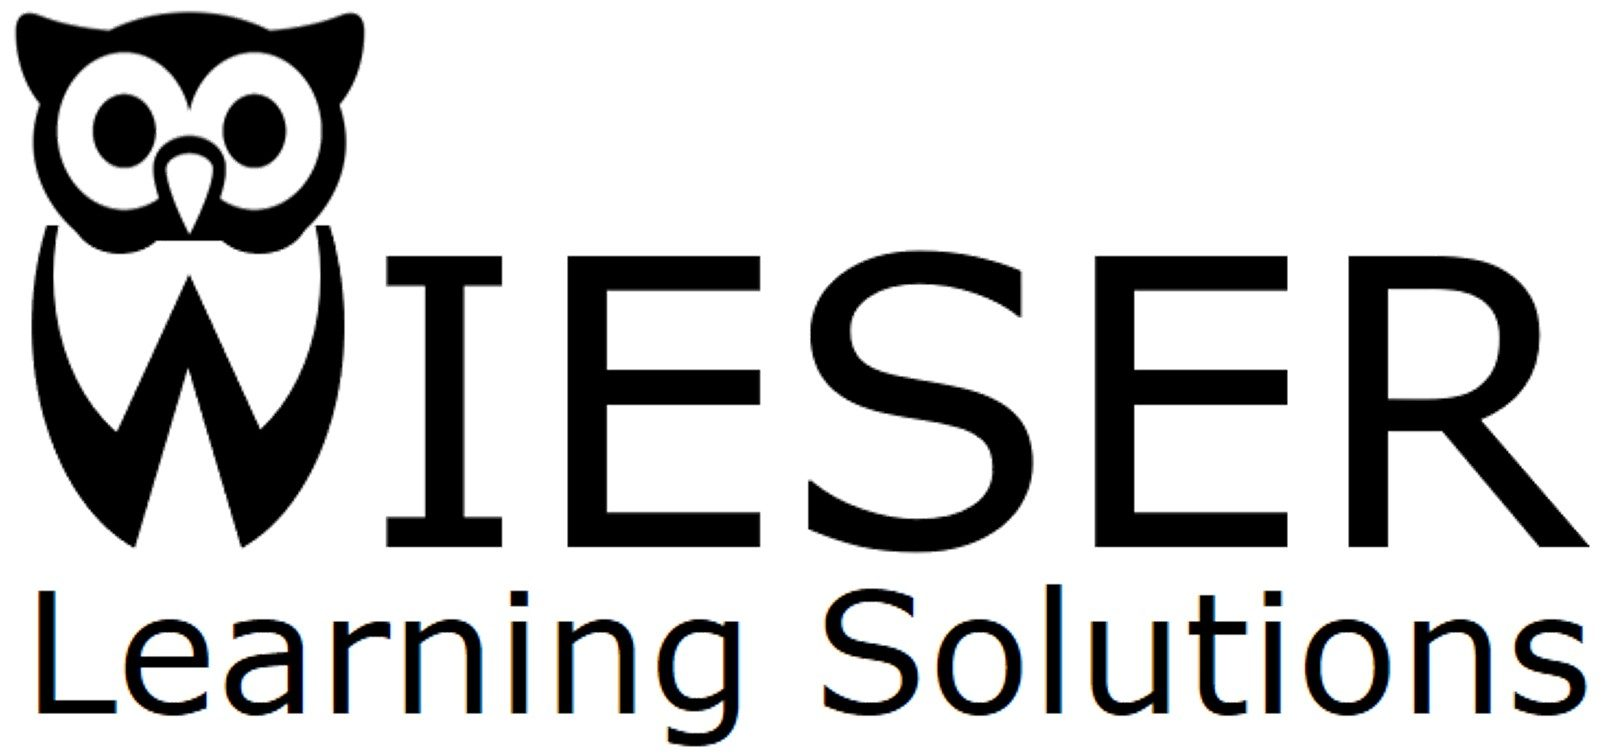 Wieser Learning Solutions, LLC